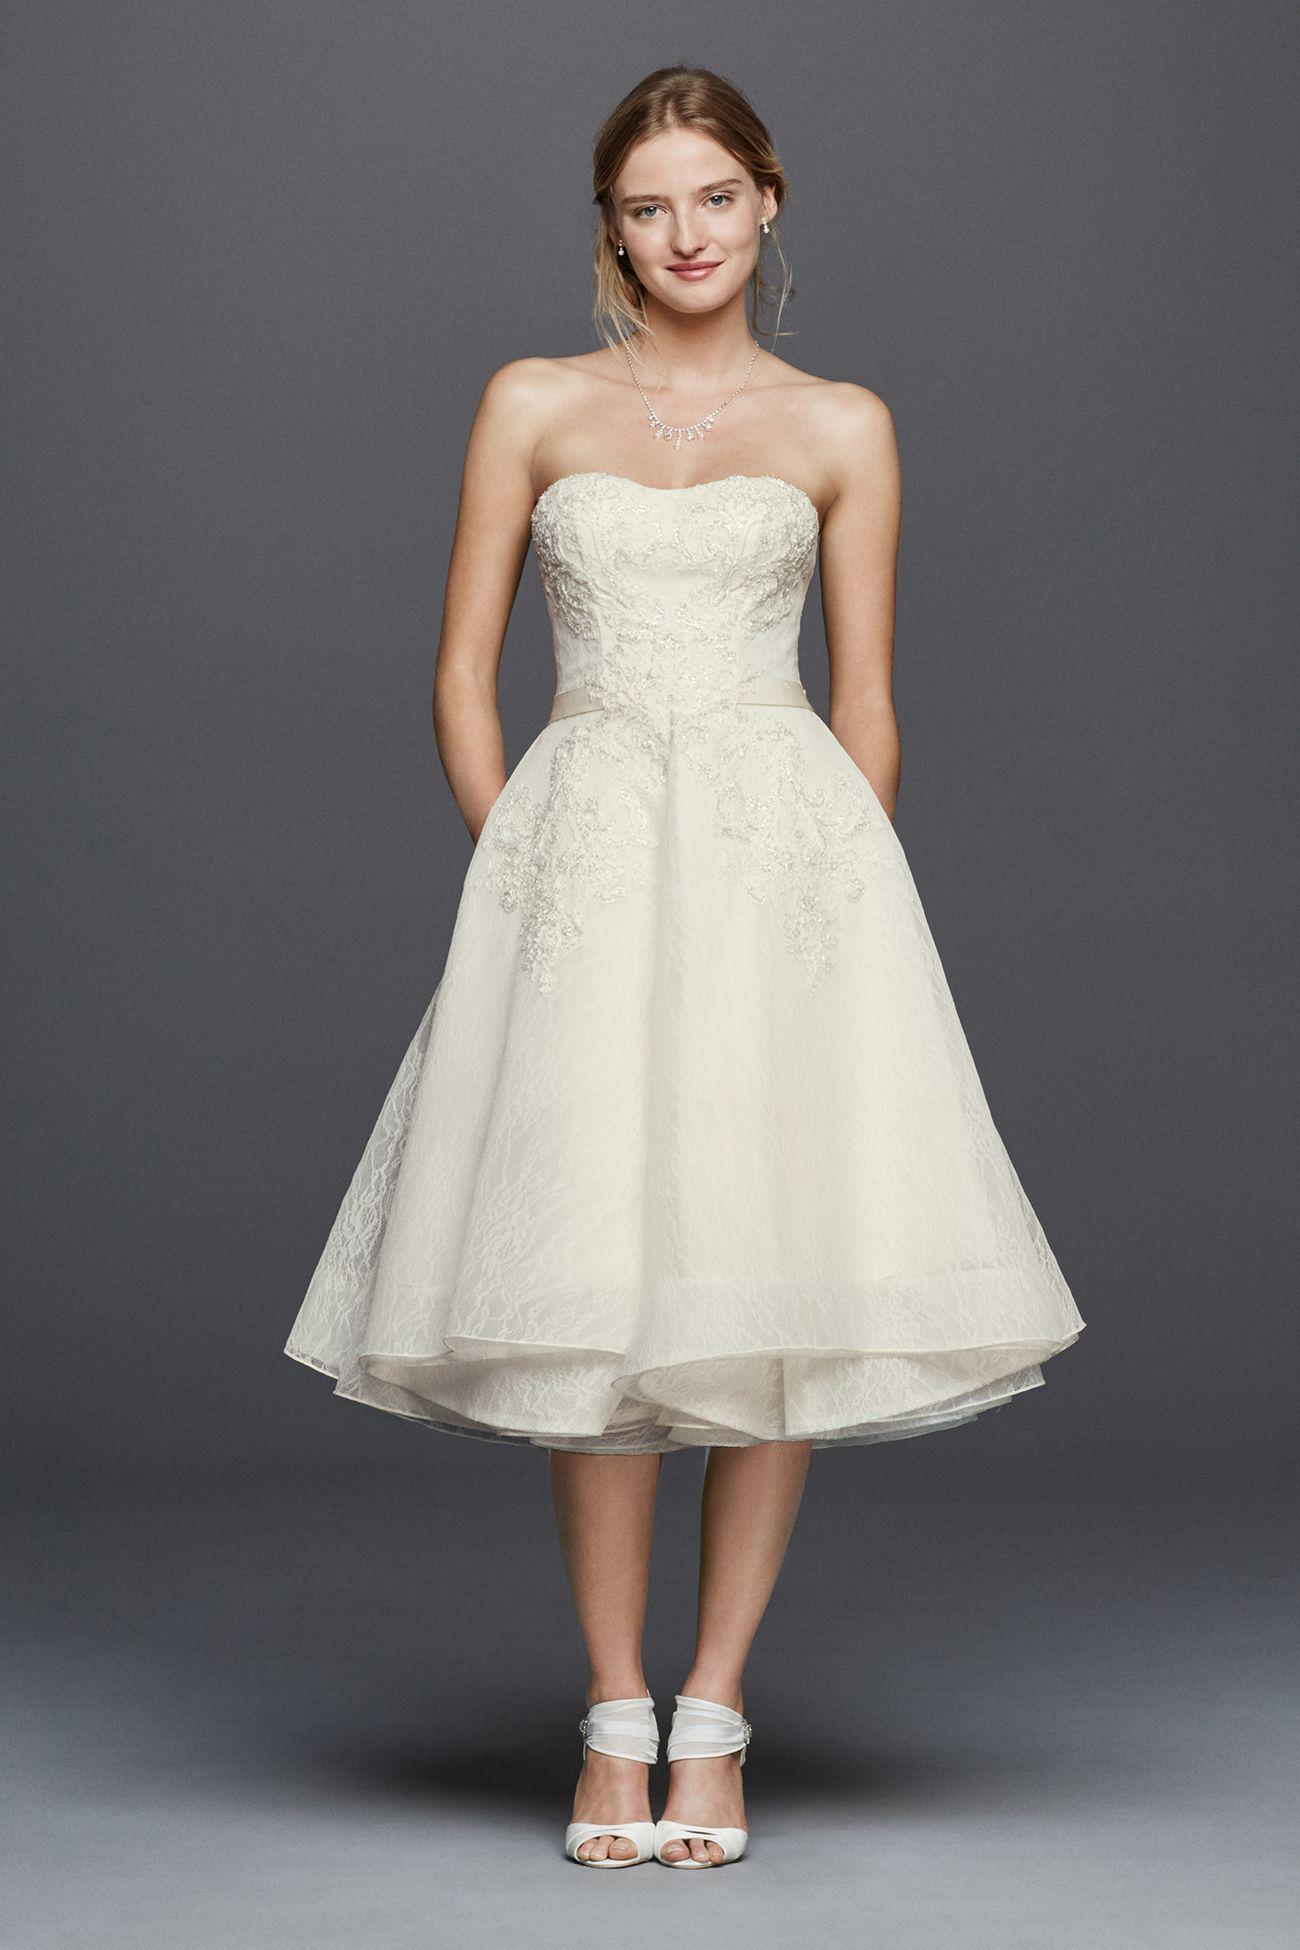 50s wedding dress lace  CWG  Wedding uc  Pinterest  Davids bridal David and Bridal